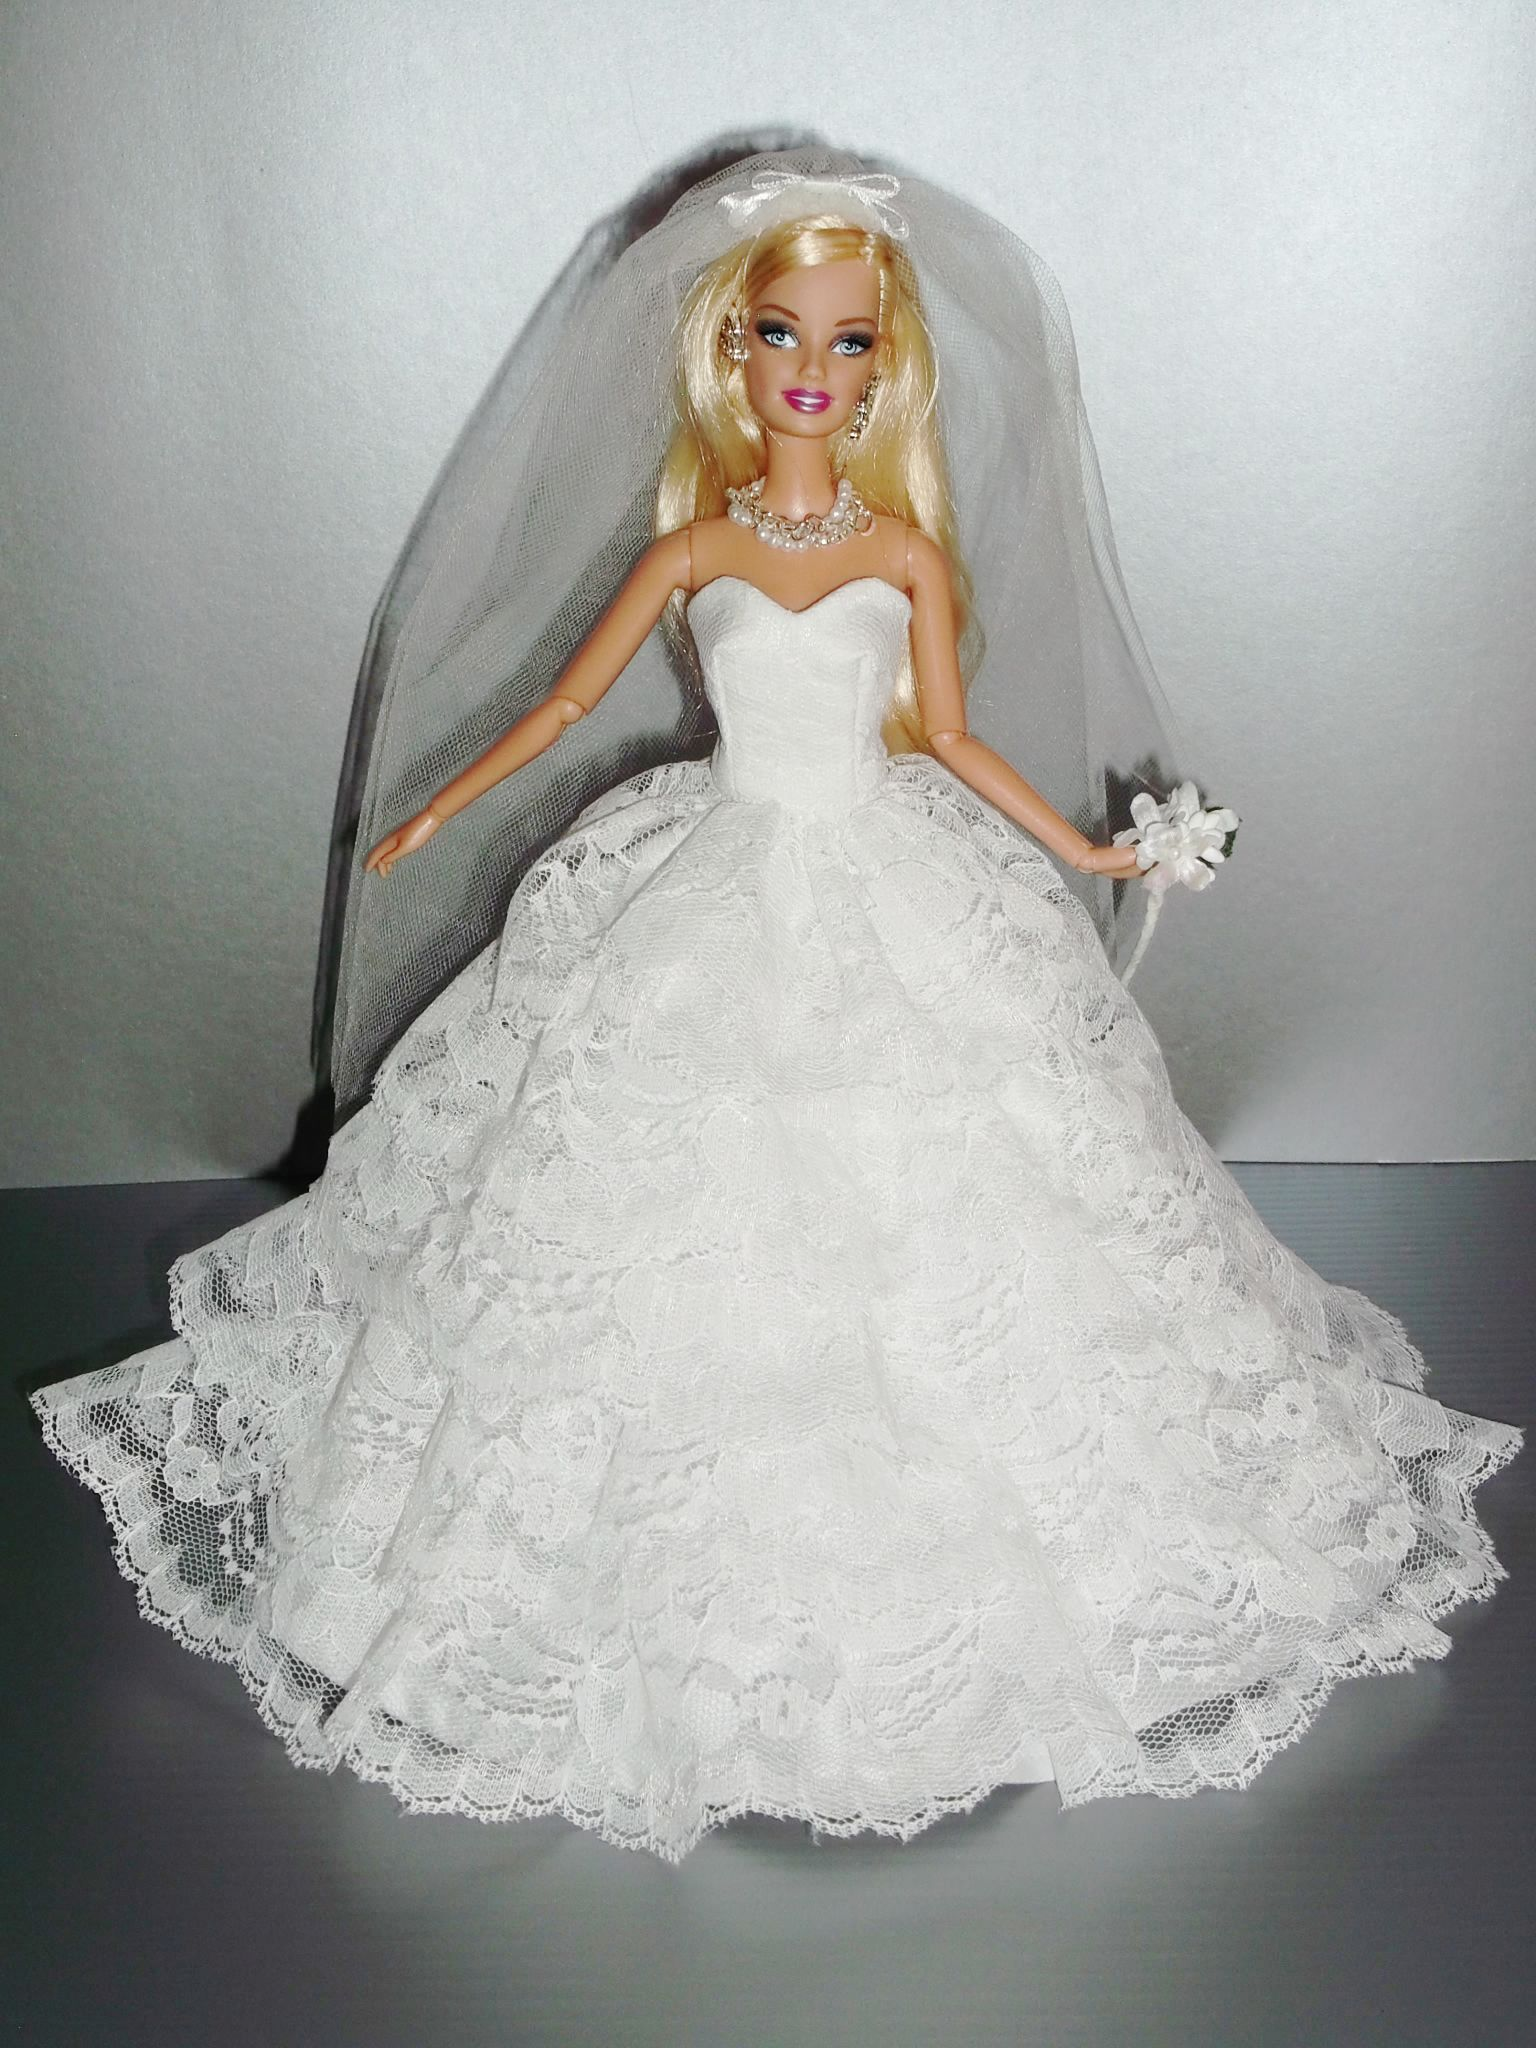 1..3/Barbie bridal wedding gowns Rocio Couture | Barbie/Doll Brides ...